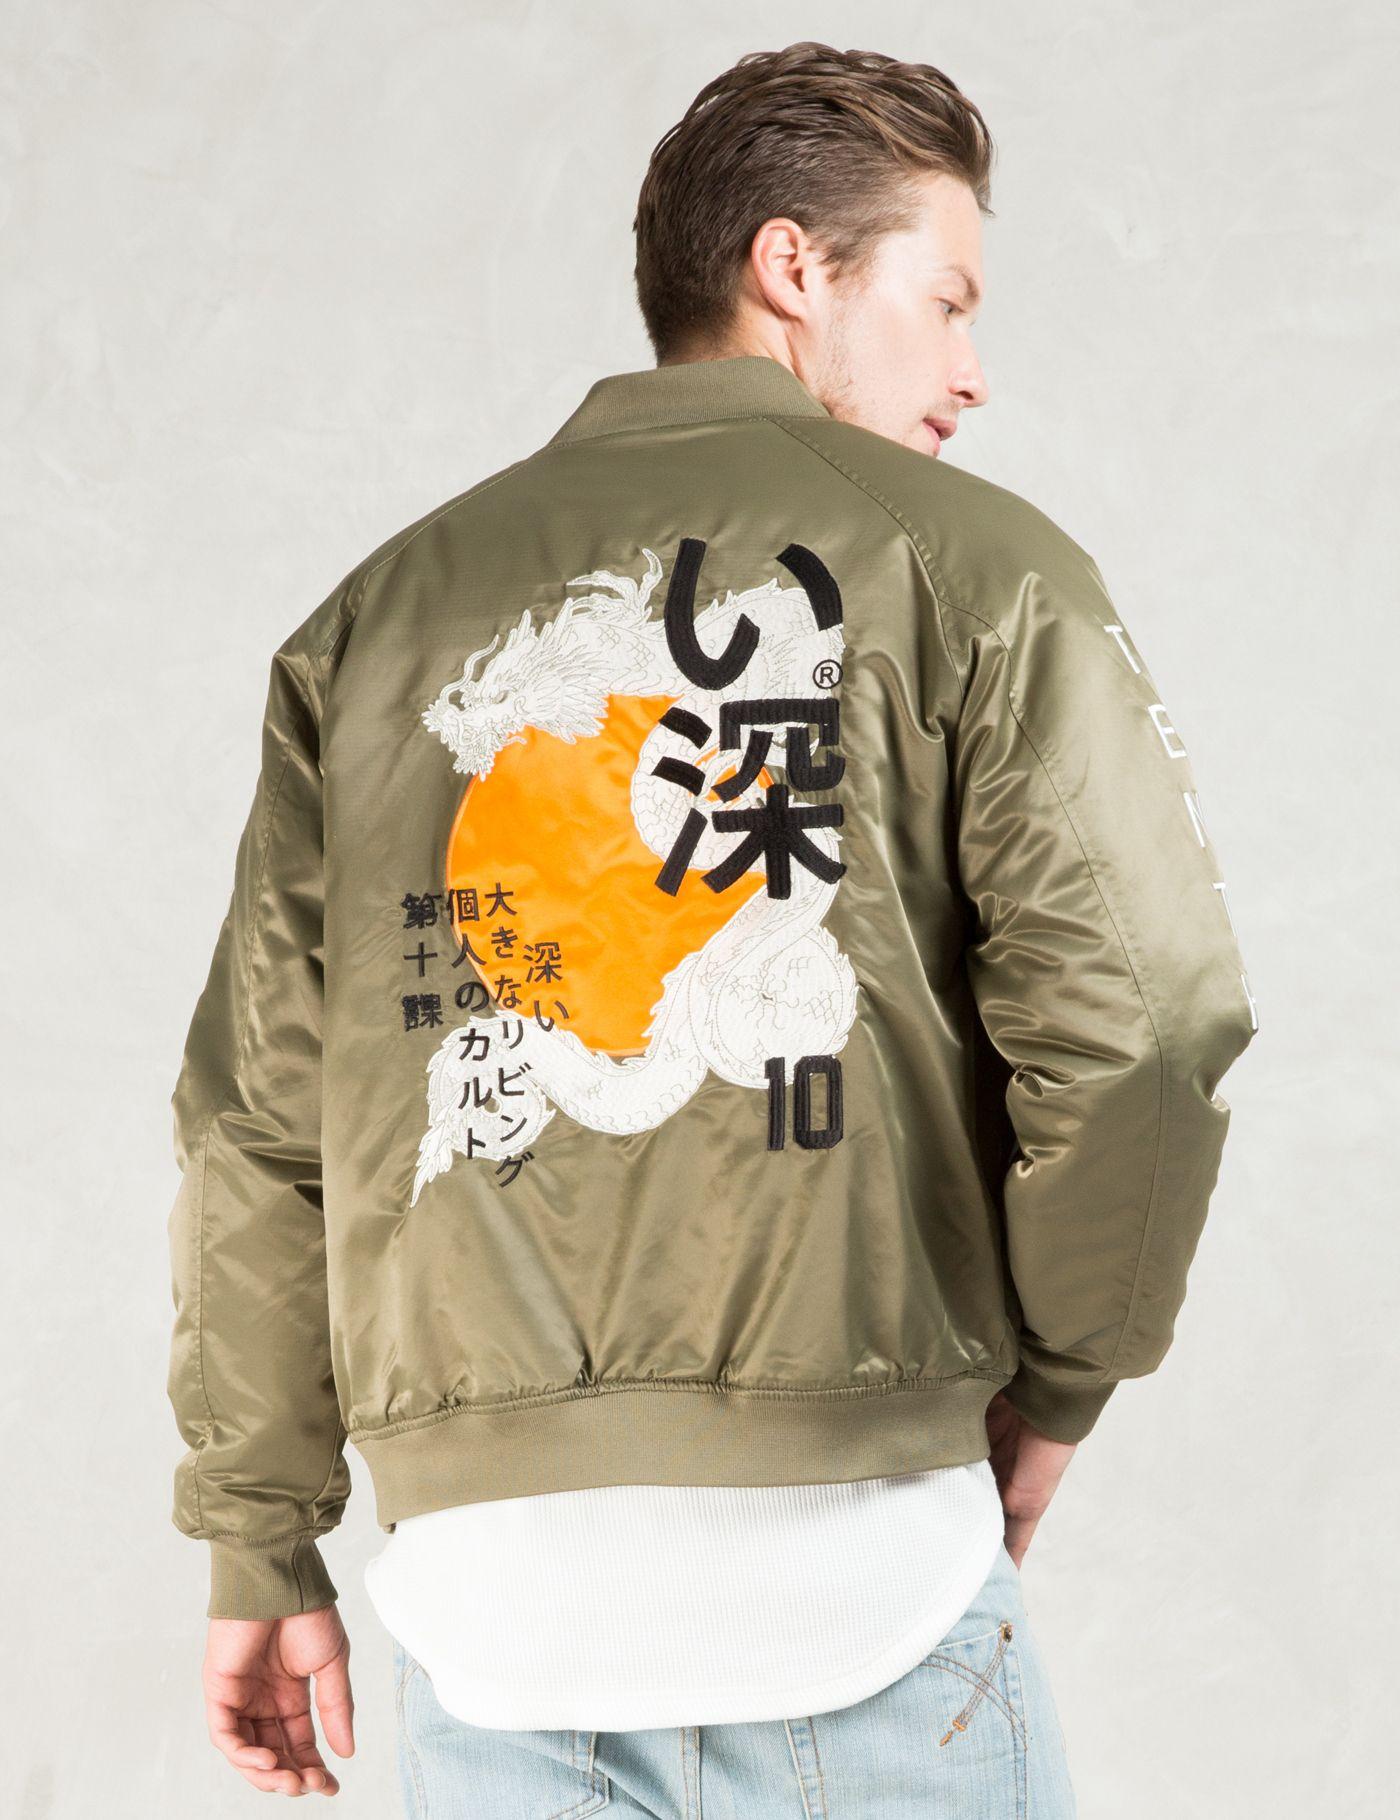 Green Wordlwide Souvenir Jacket Jackets, Denim jacket